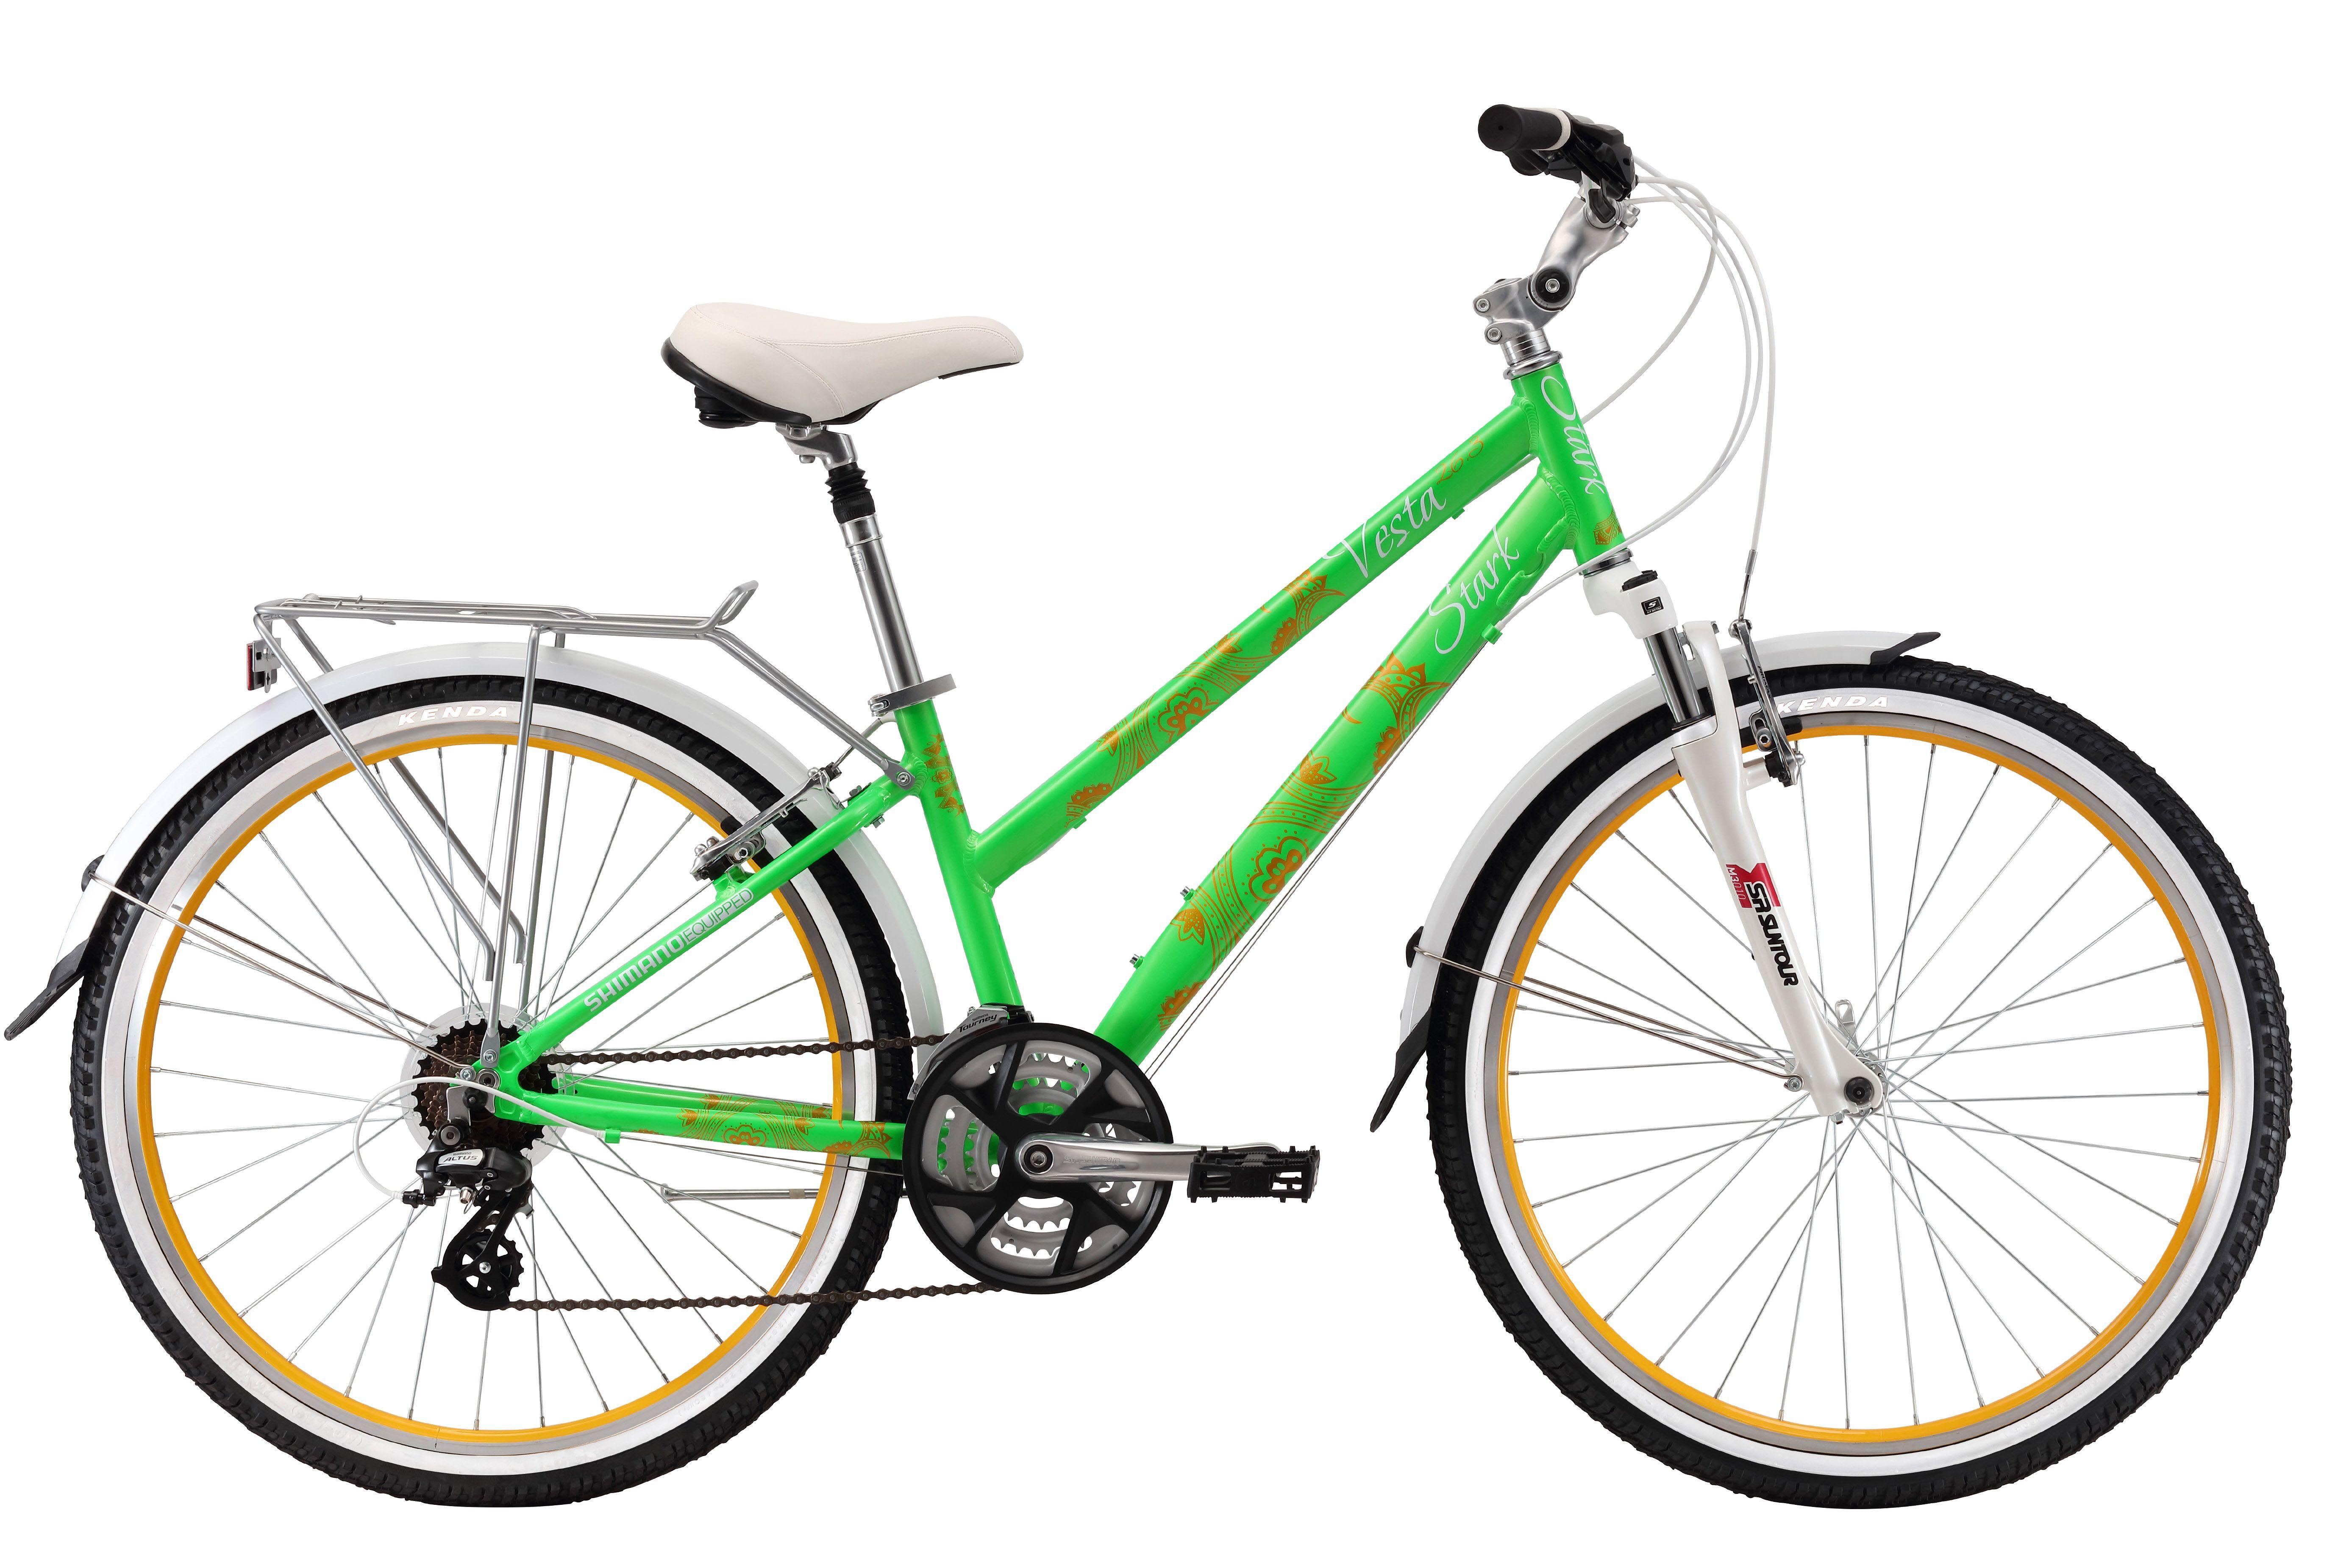 Велосипед Stark Vesta 26.3 V 2017 велосипед stark vesta 26 1 s 2018